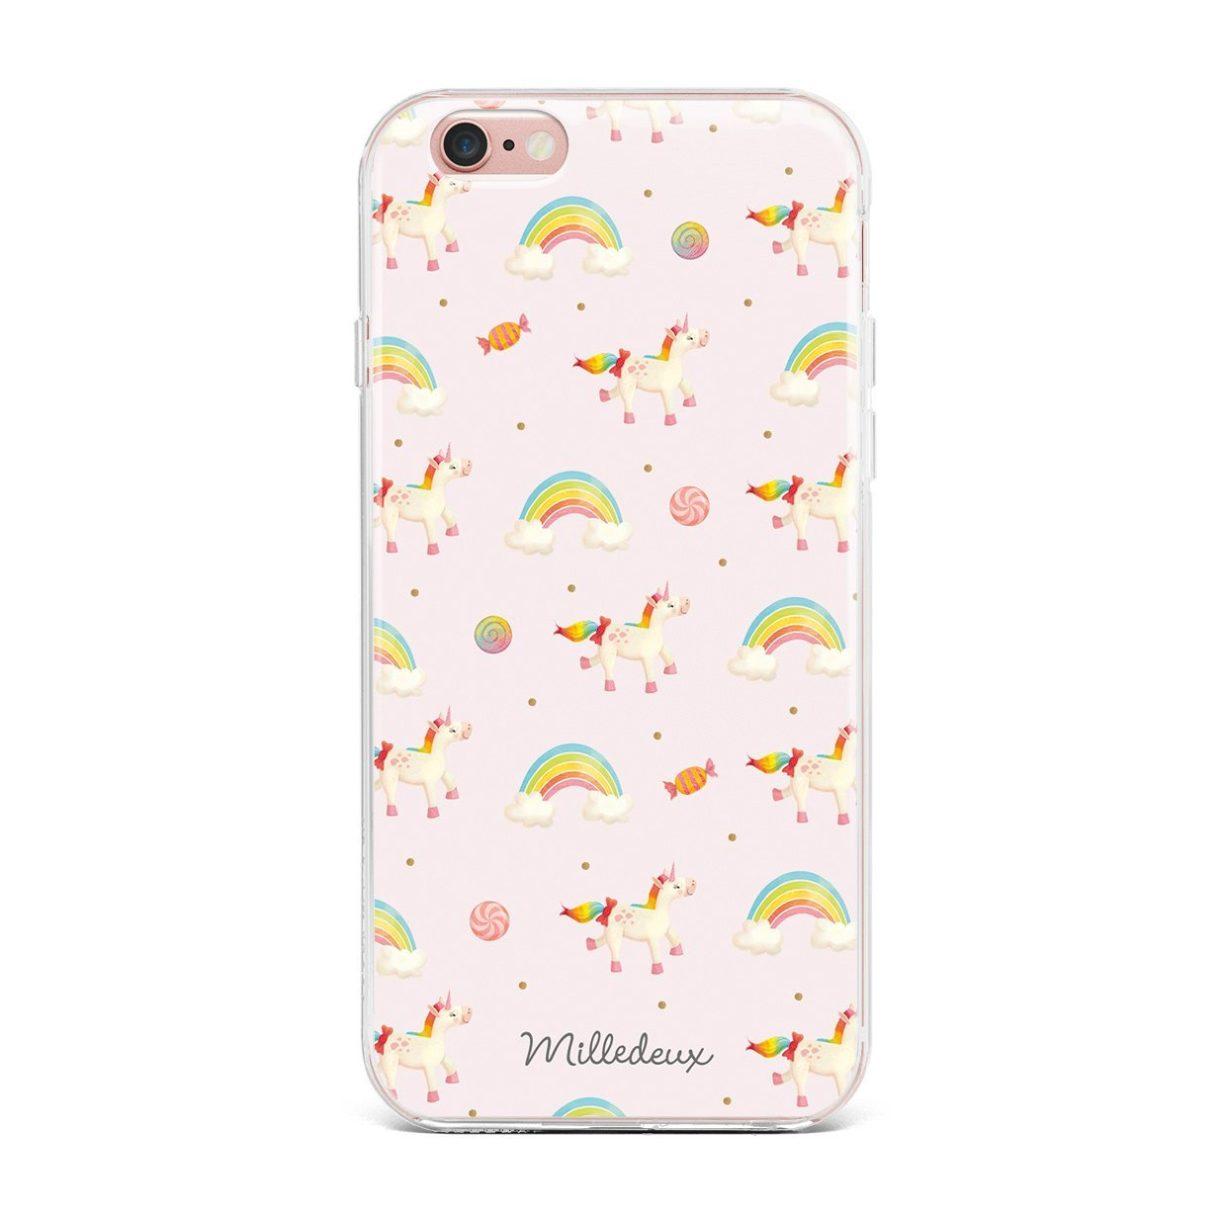 unicorn iphone cover